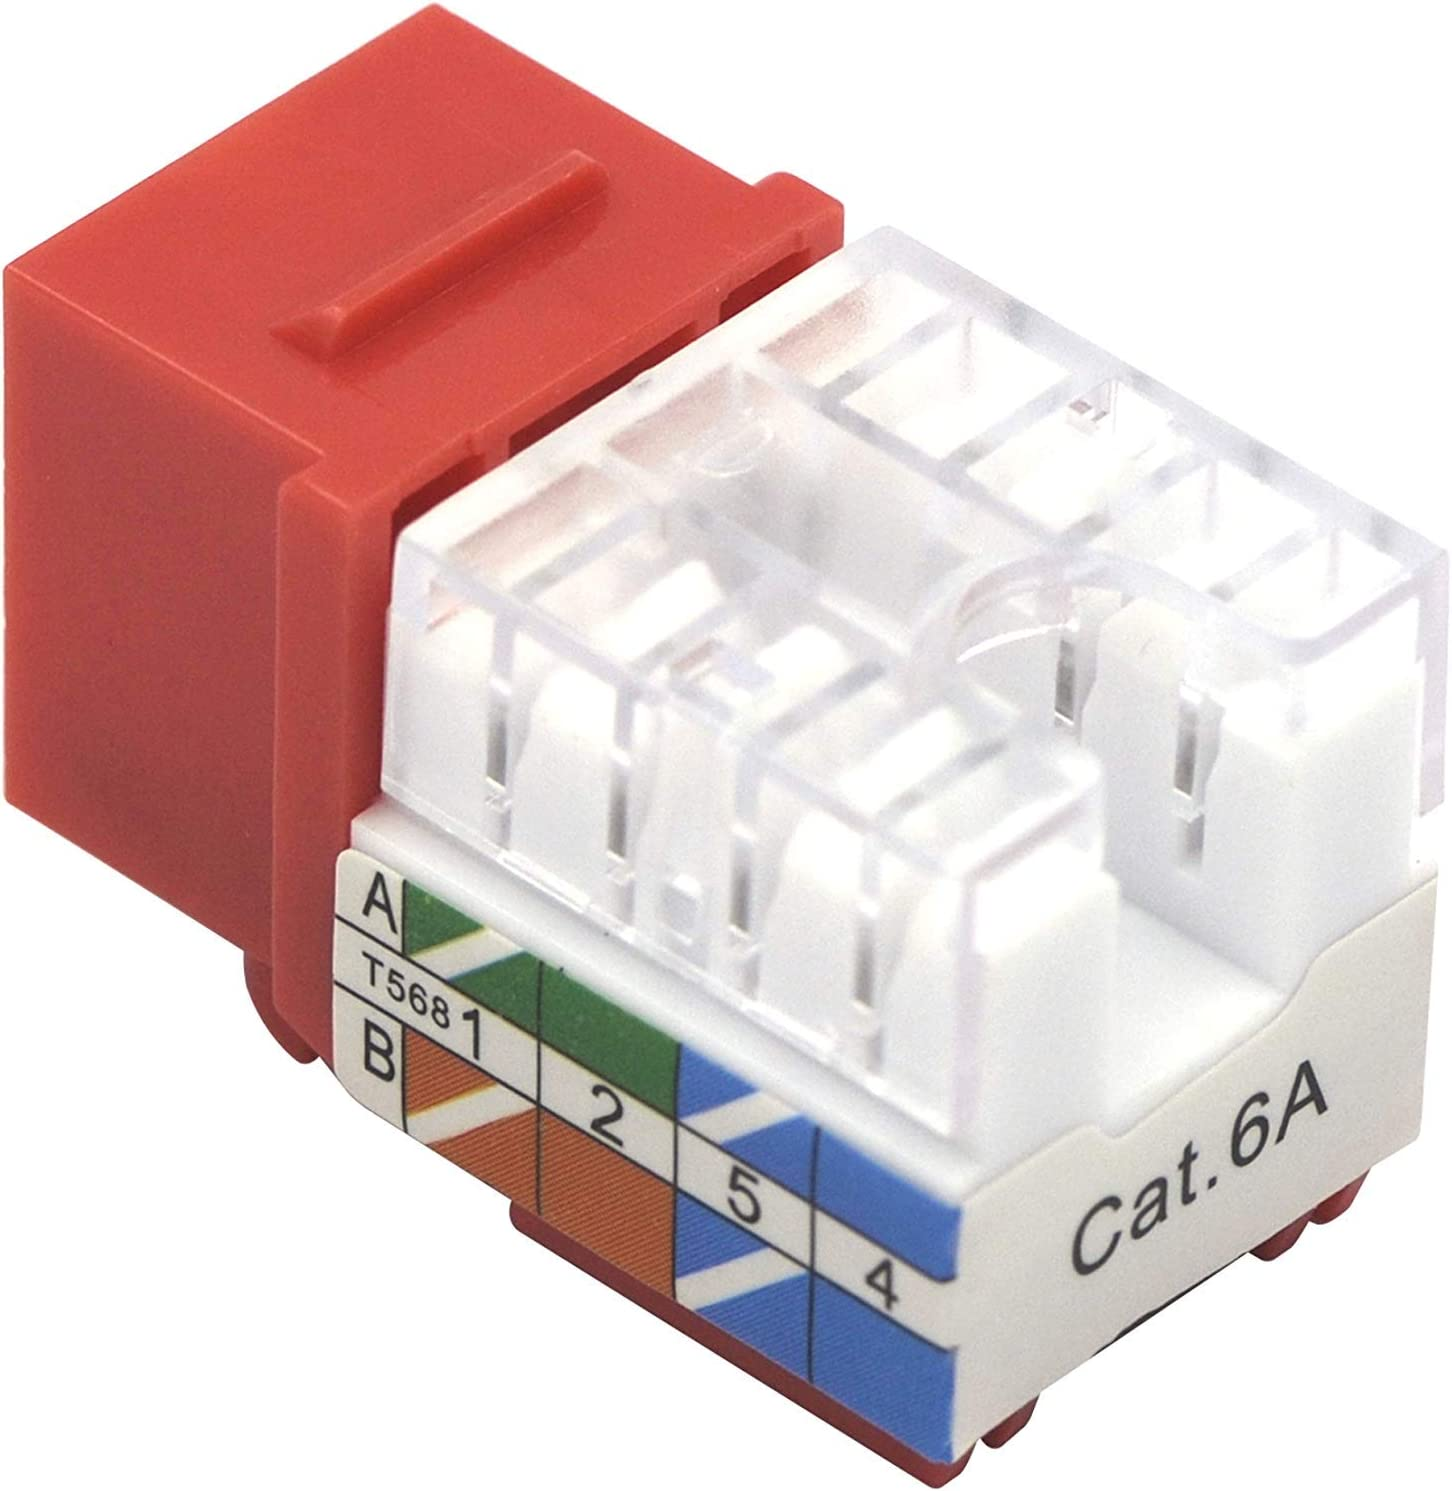 VCE 50 Pack Cat6A RJ45 90-Degree Keystone Jack Insert Bundle with 25-Pack RJ45 Cat6A 90-Degree Keystone Jack Insert